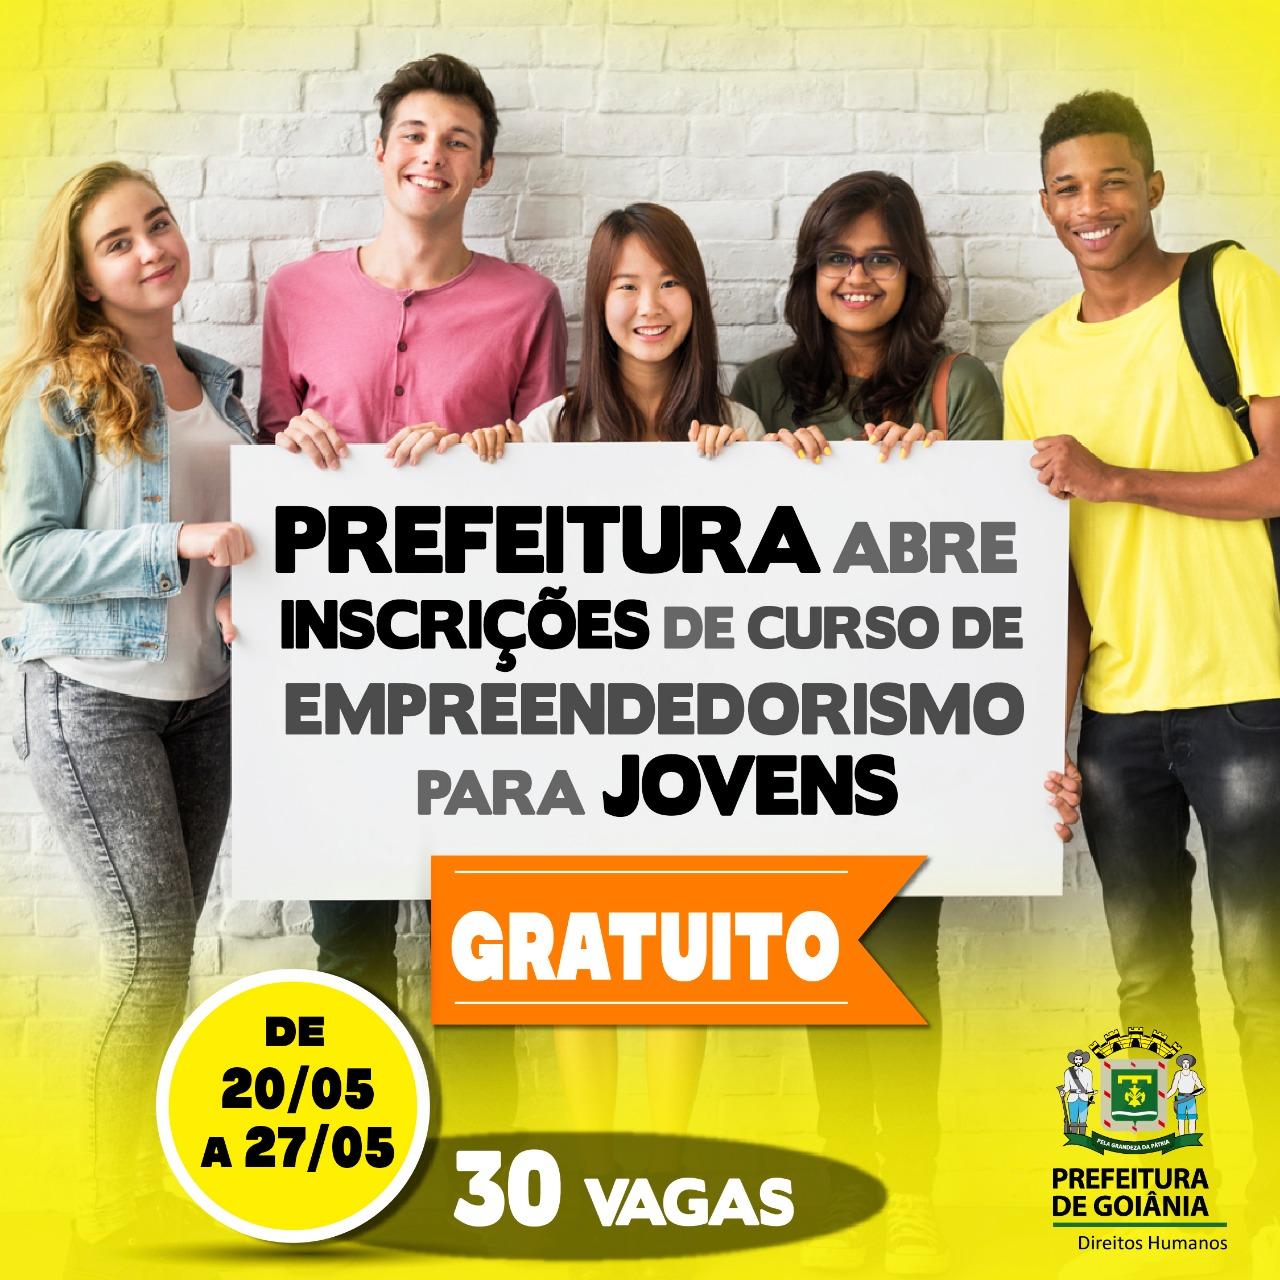 Prefeitura abre inscri��es para cursos gratuitos sobre empreendedorismo para jovens